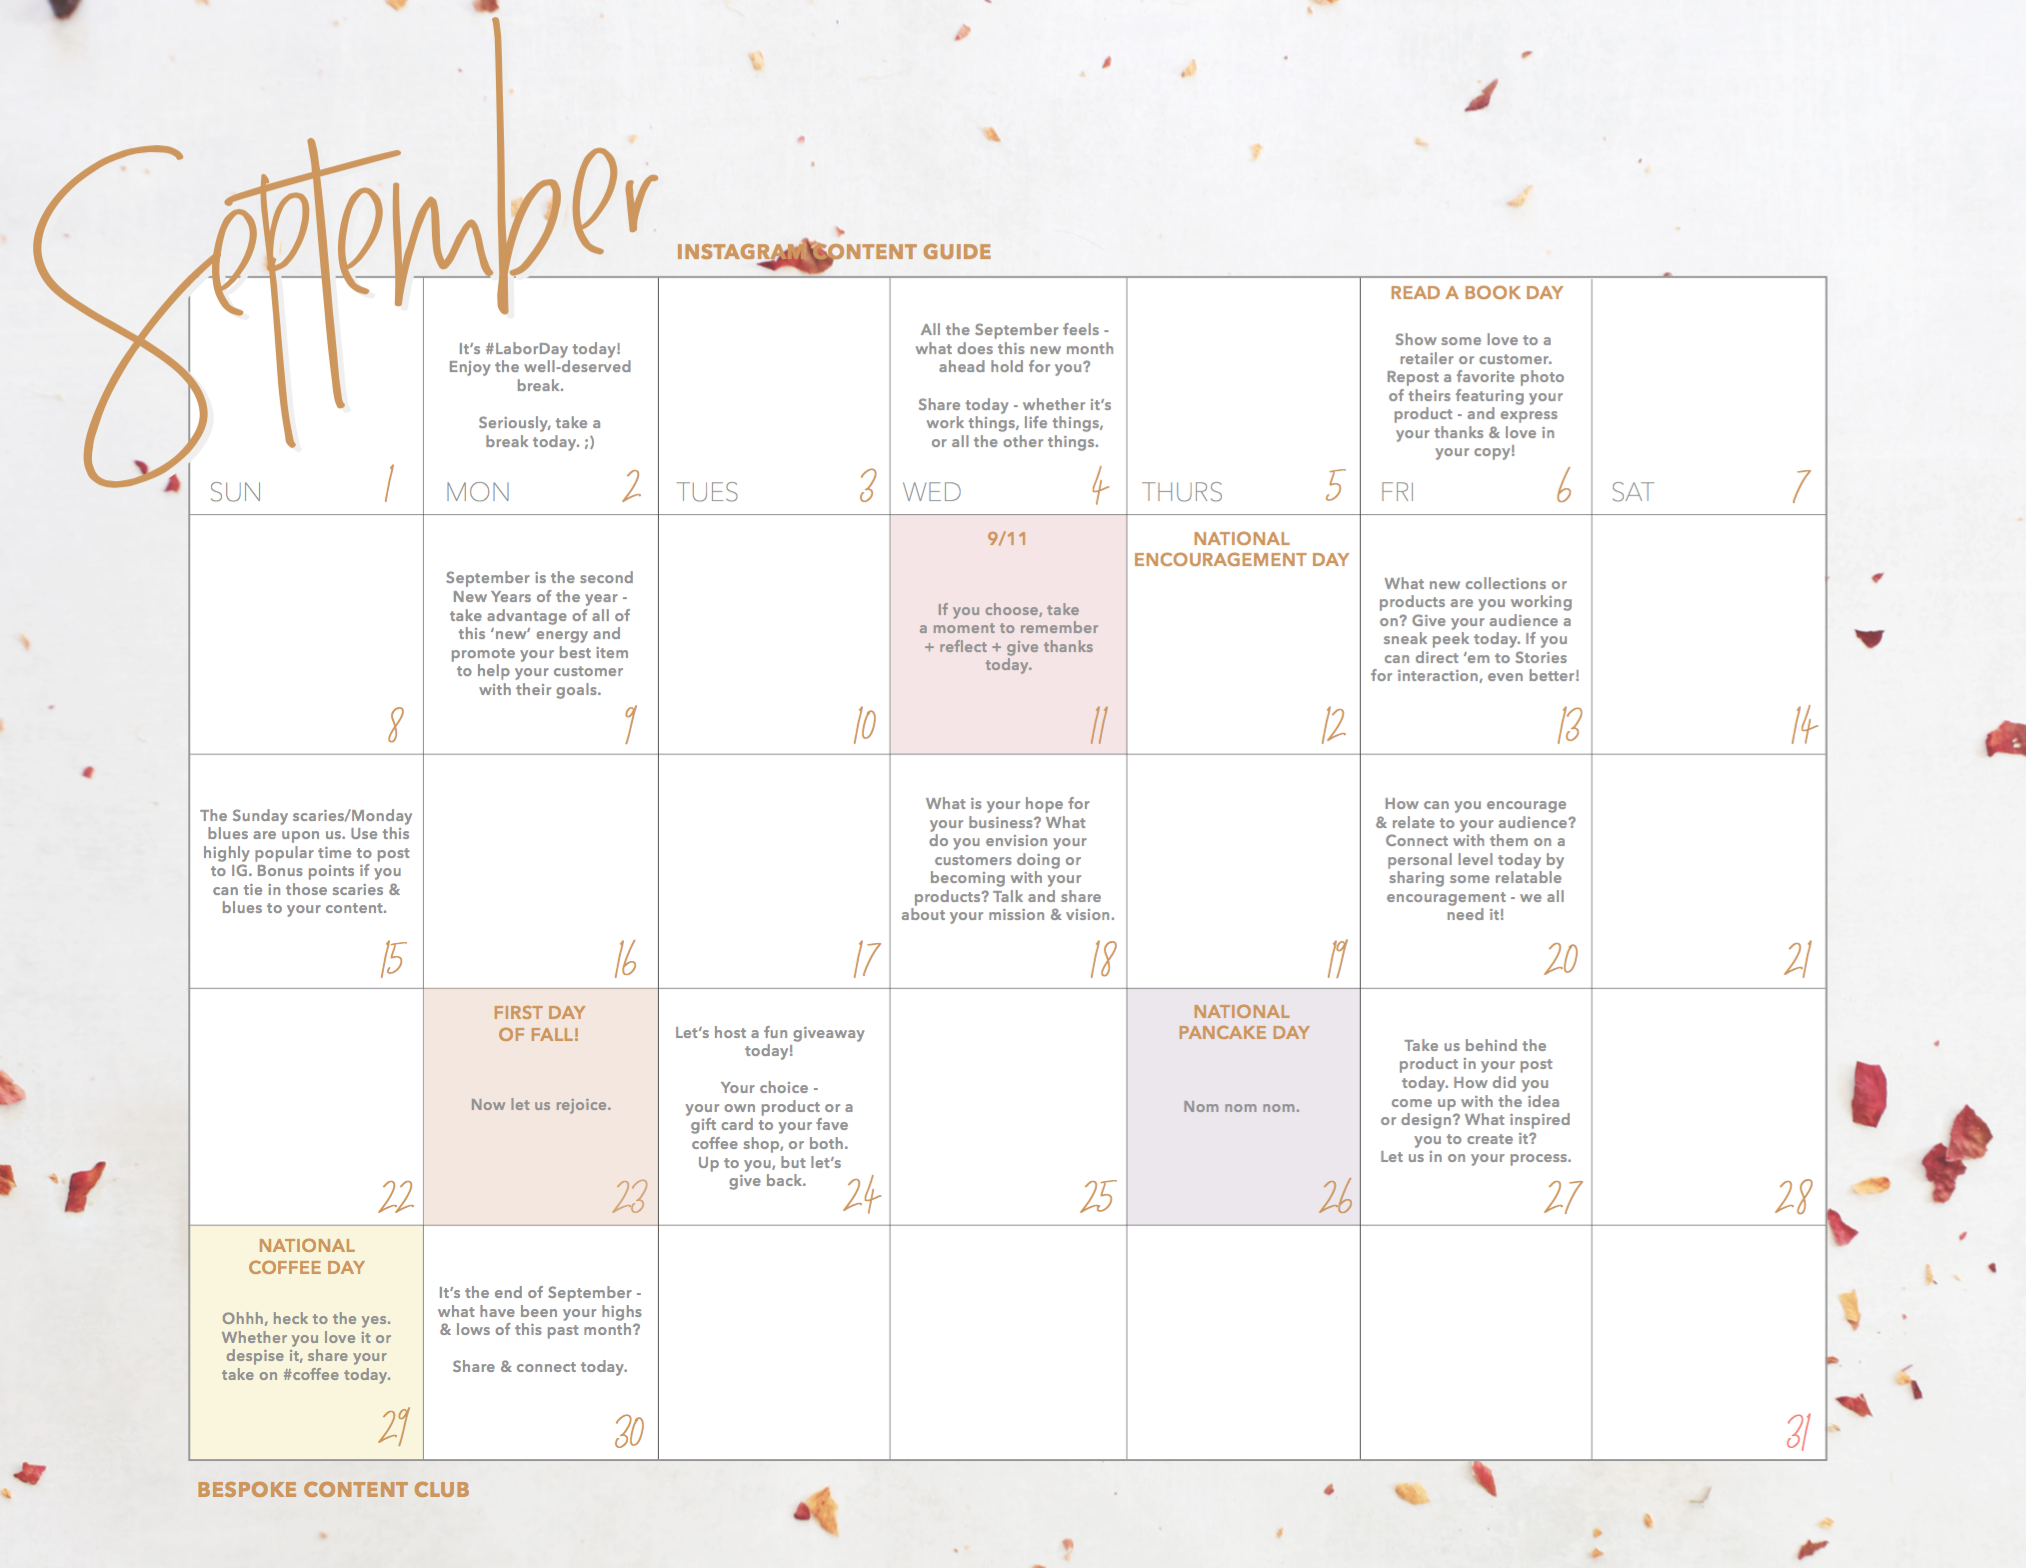 September Instagram Content Calendar for Bespoke Content Club